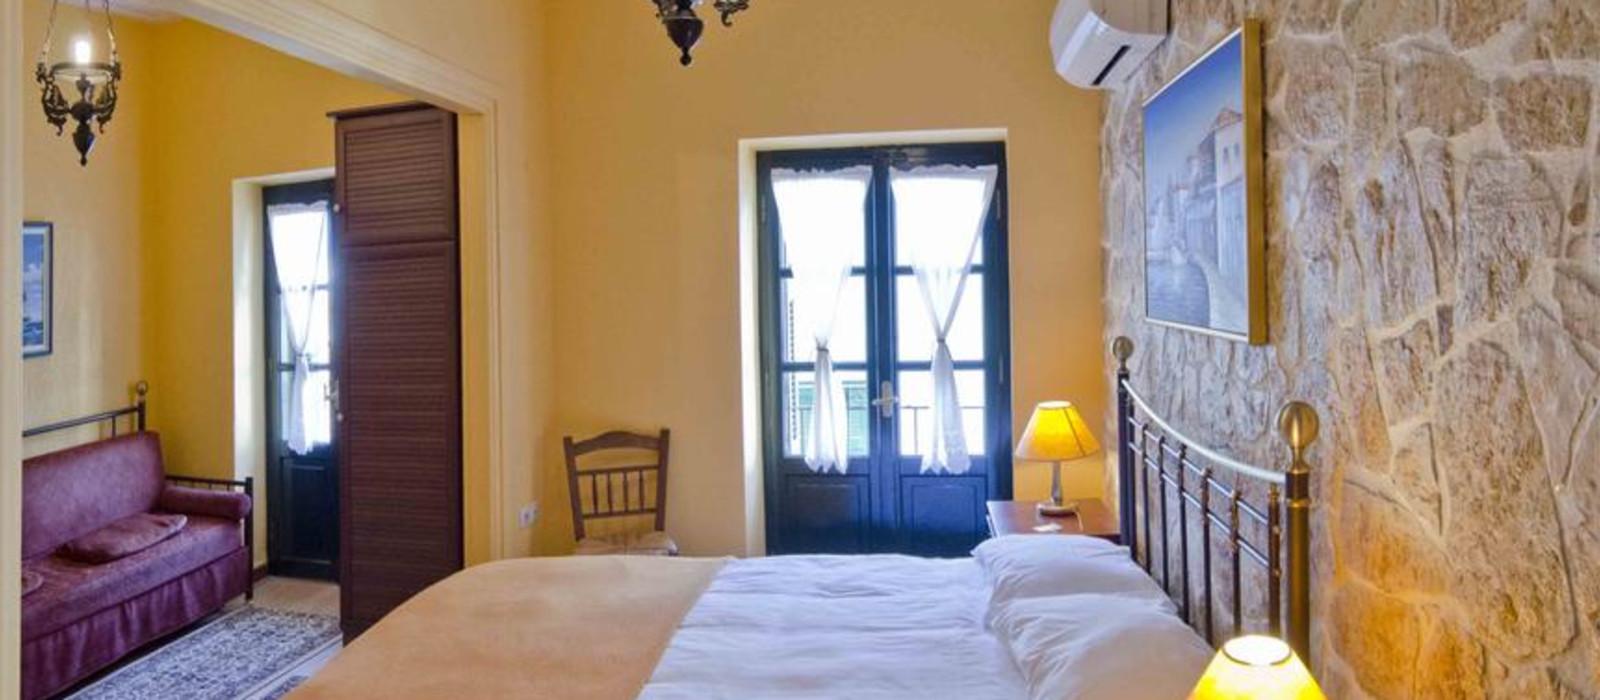 Hotel Pension Marianna Greece